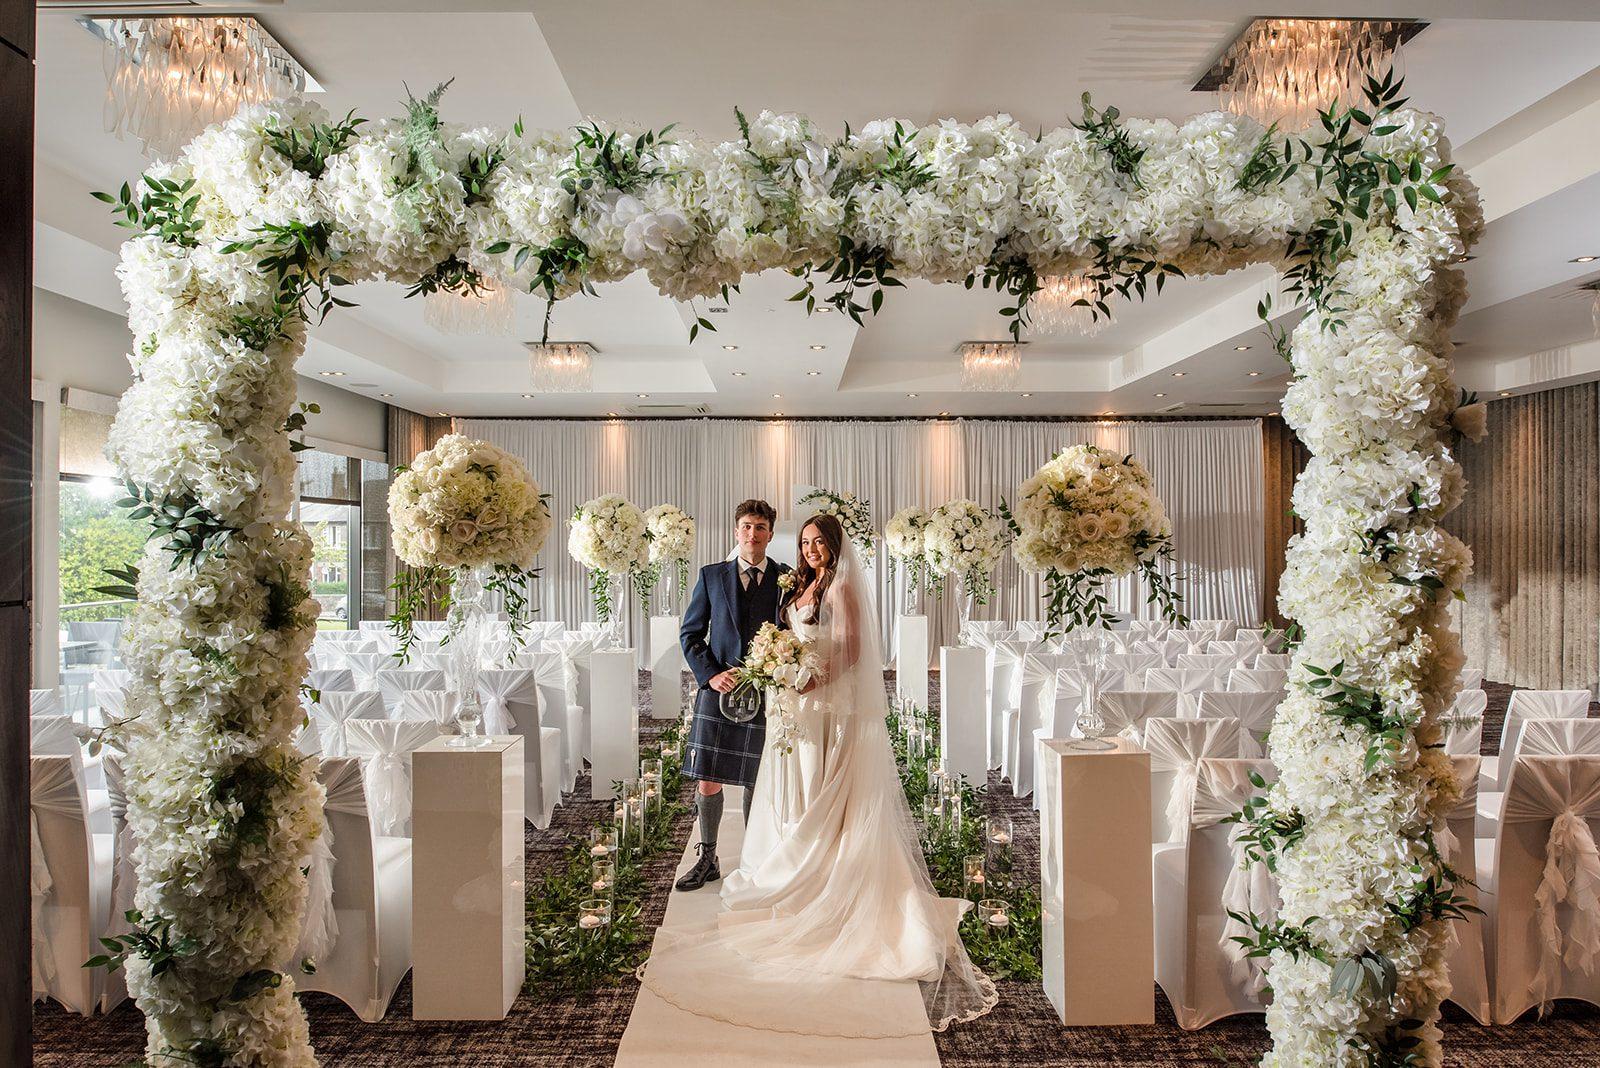 Carlton Hotel Wedding Packages